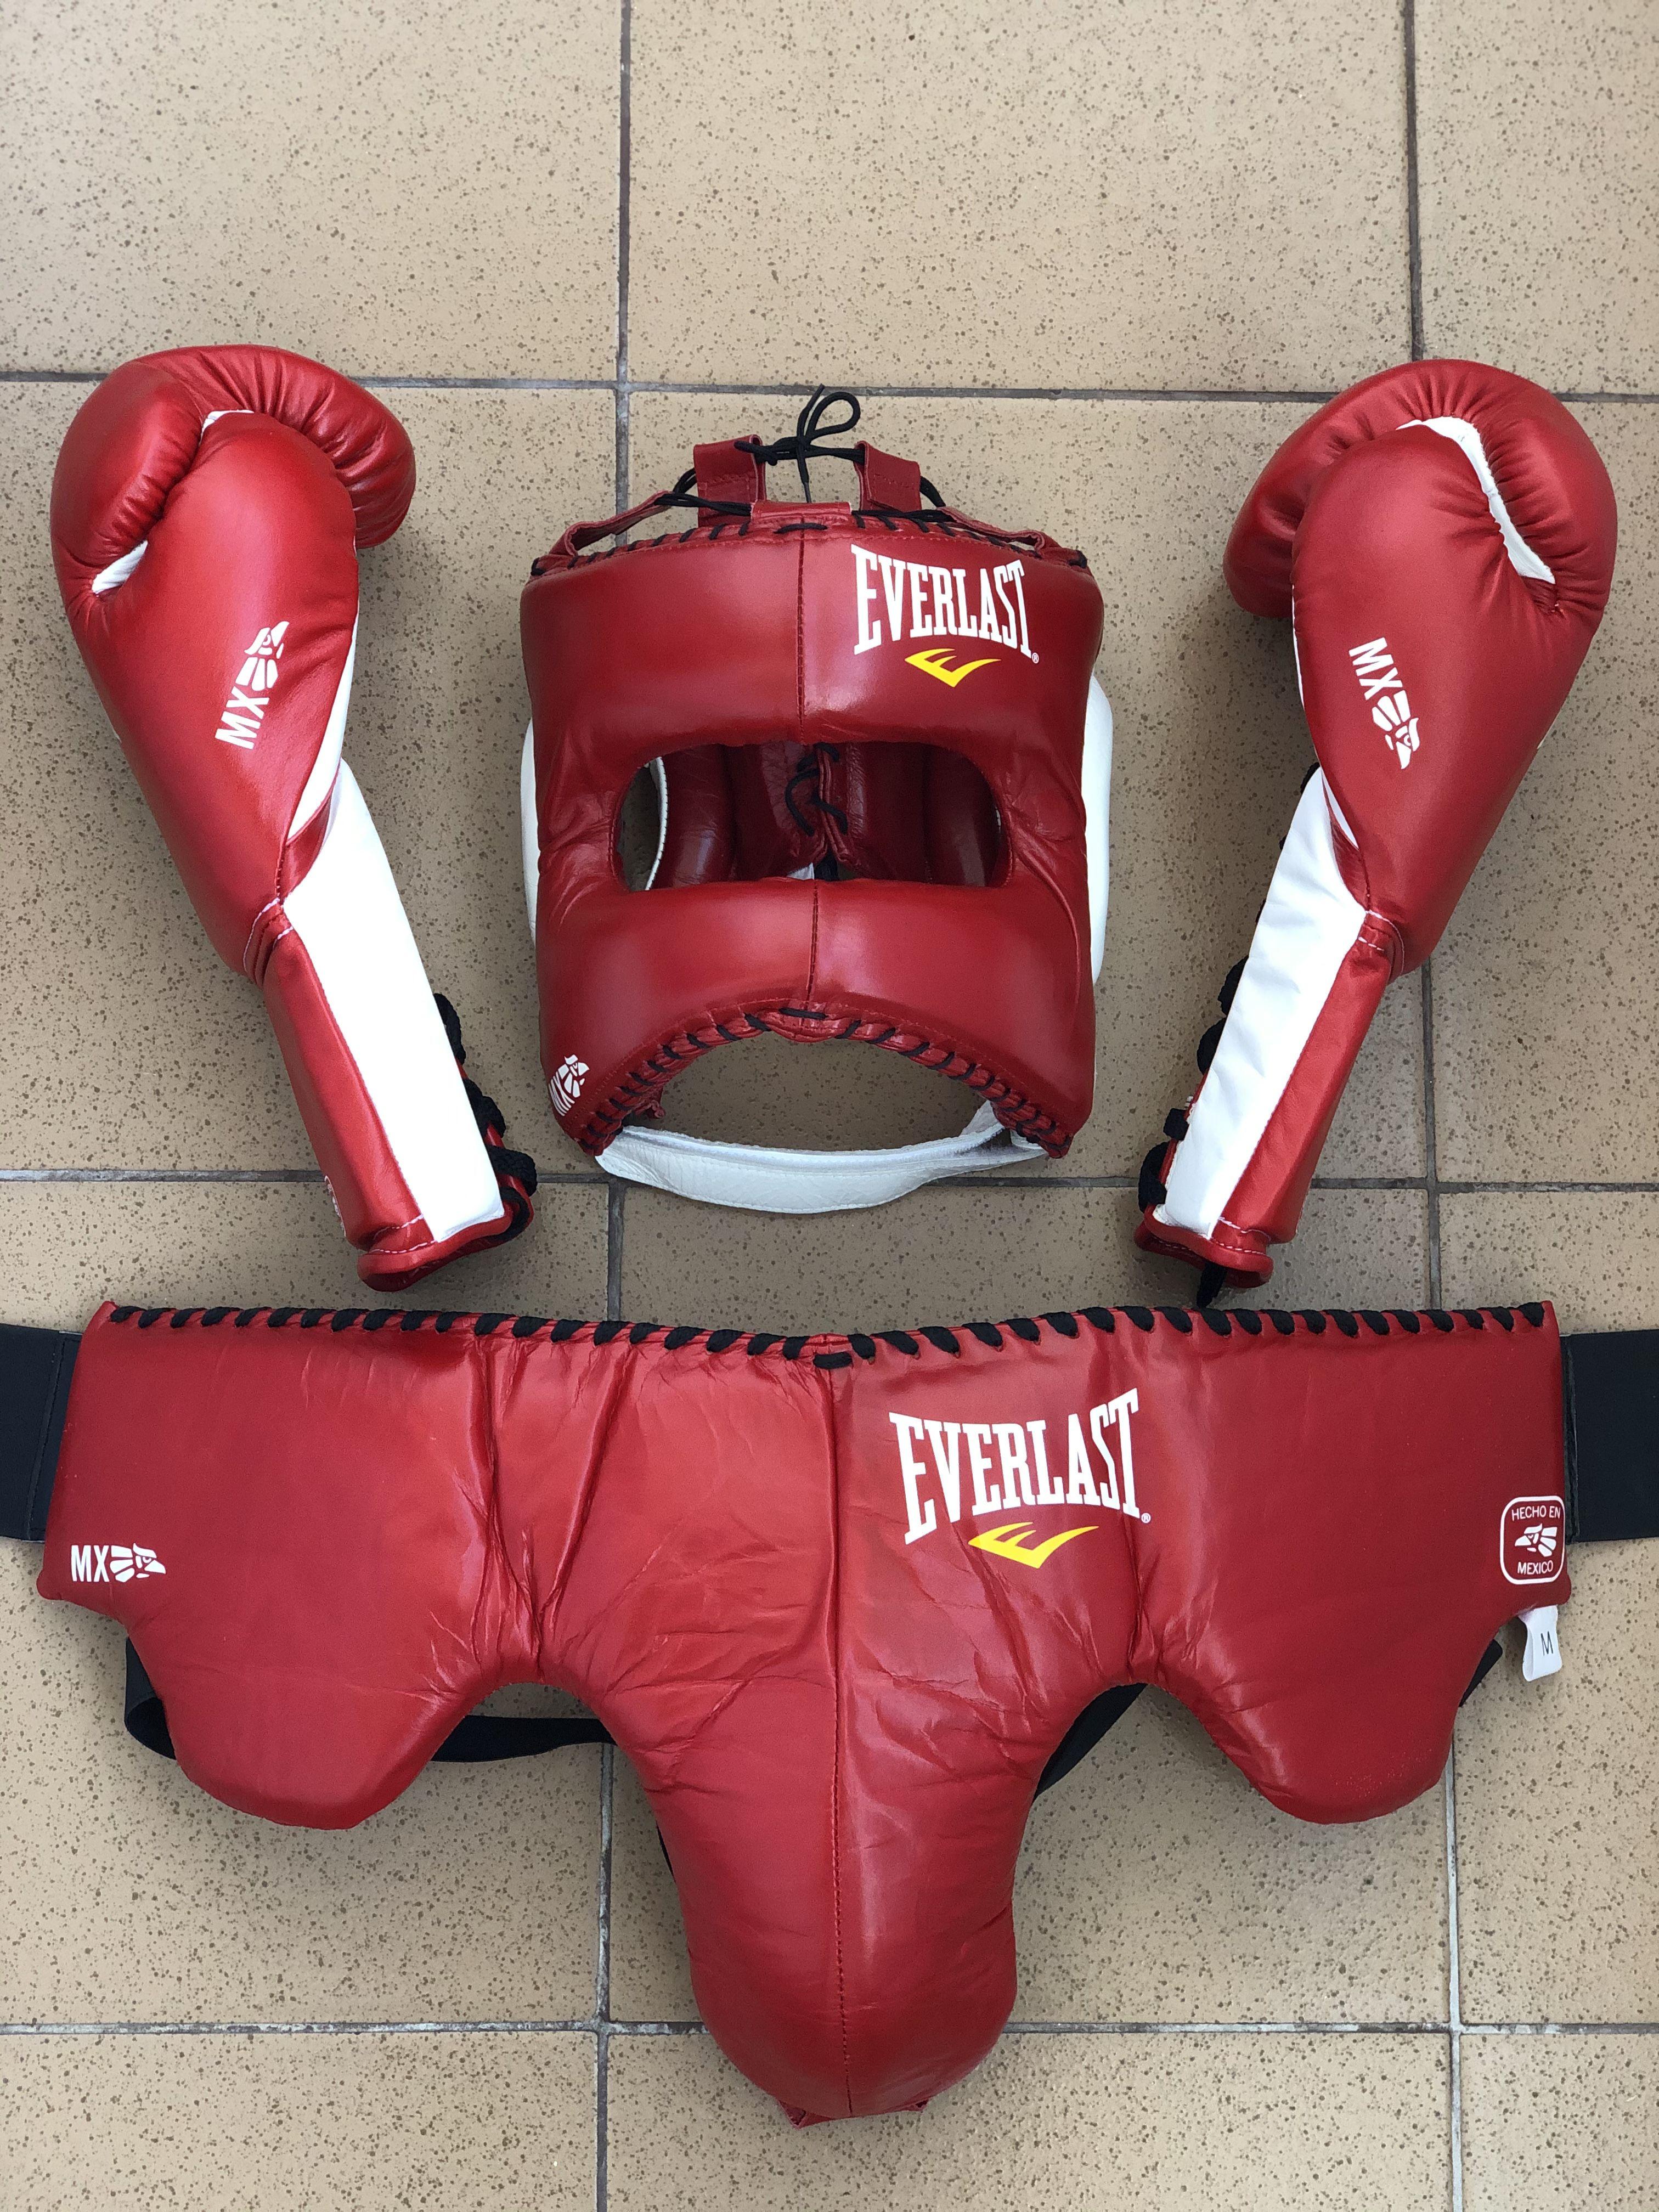 Pin de Andriy Nalyvaiko em Boxing em 2020 Luva de boxe